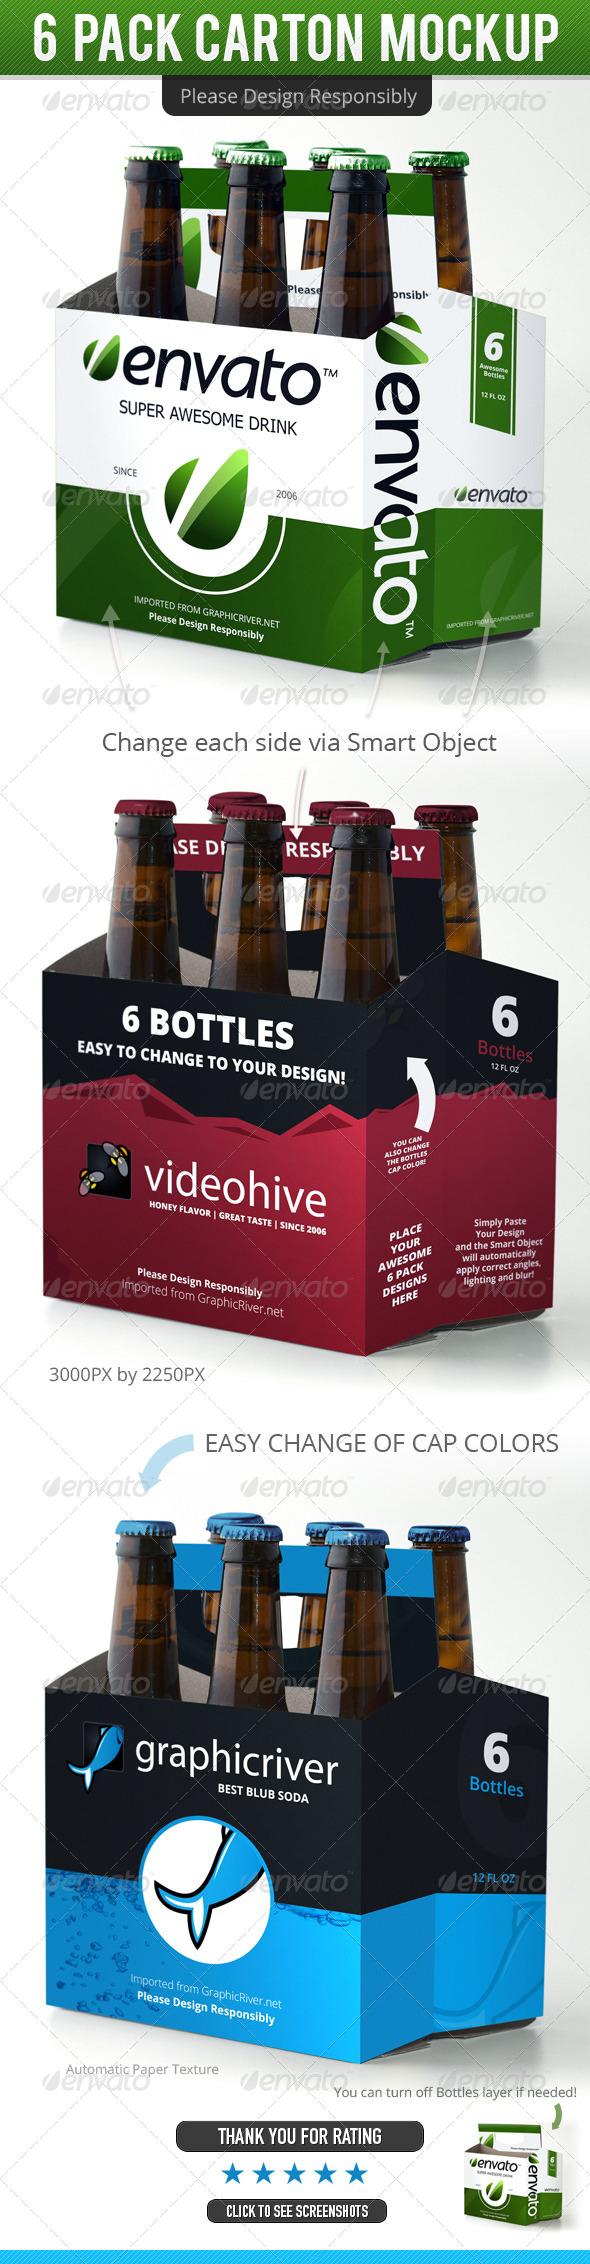 6 Pack Beer Carton Mockup